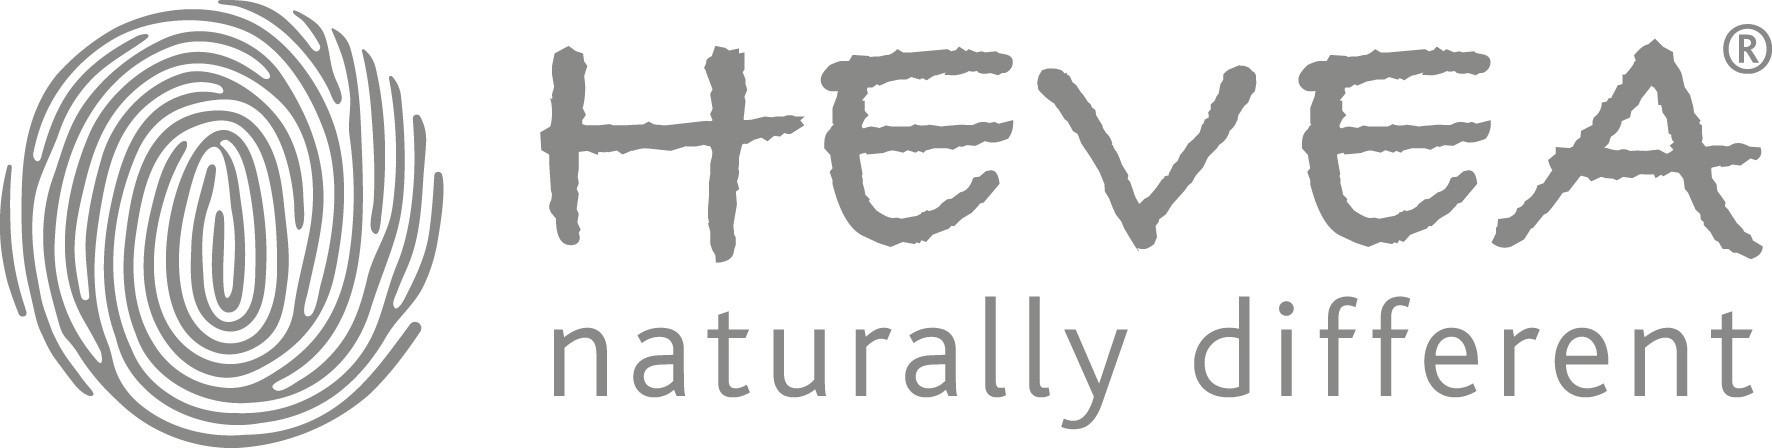 La marque Hevea